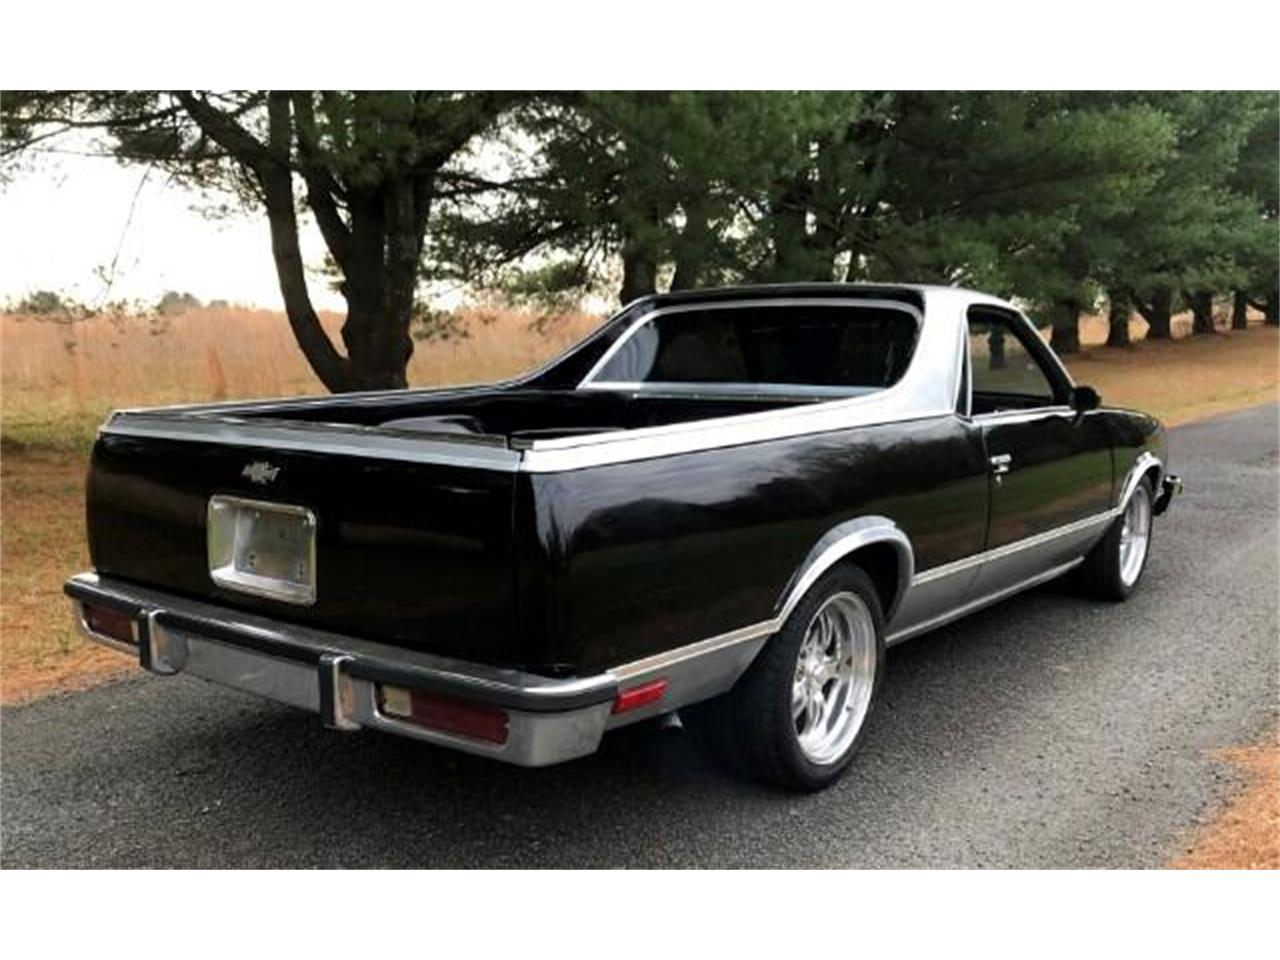 1984 Chevrolet El Camino (CC-1355625) for sale in Harpers Ferry, West Virginia